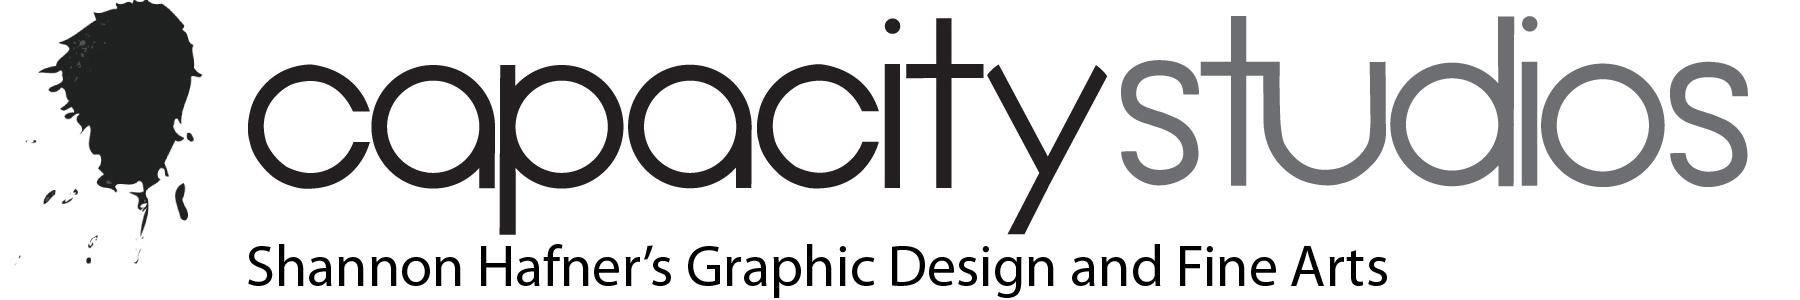 Capacity Studios